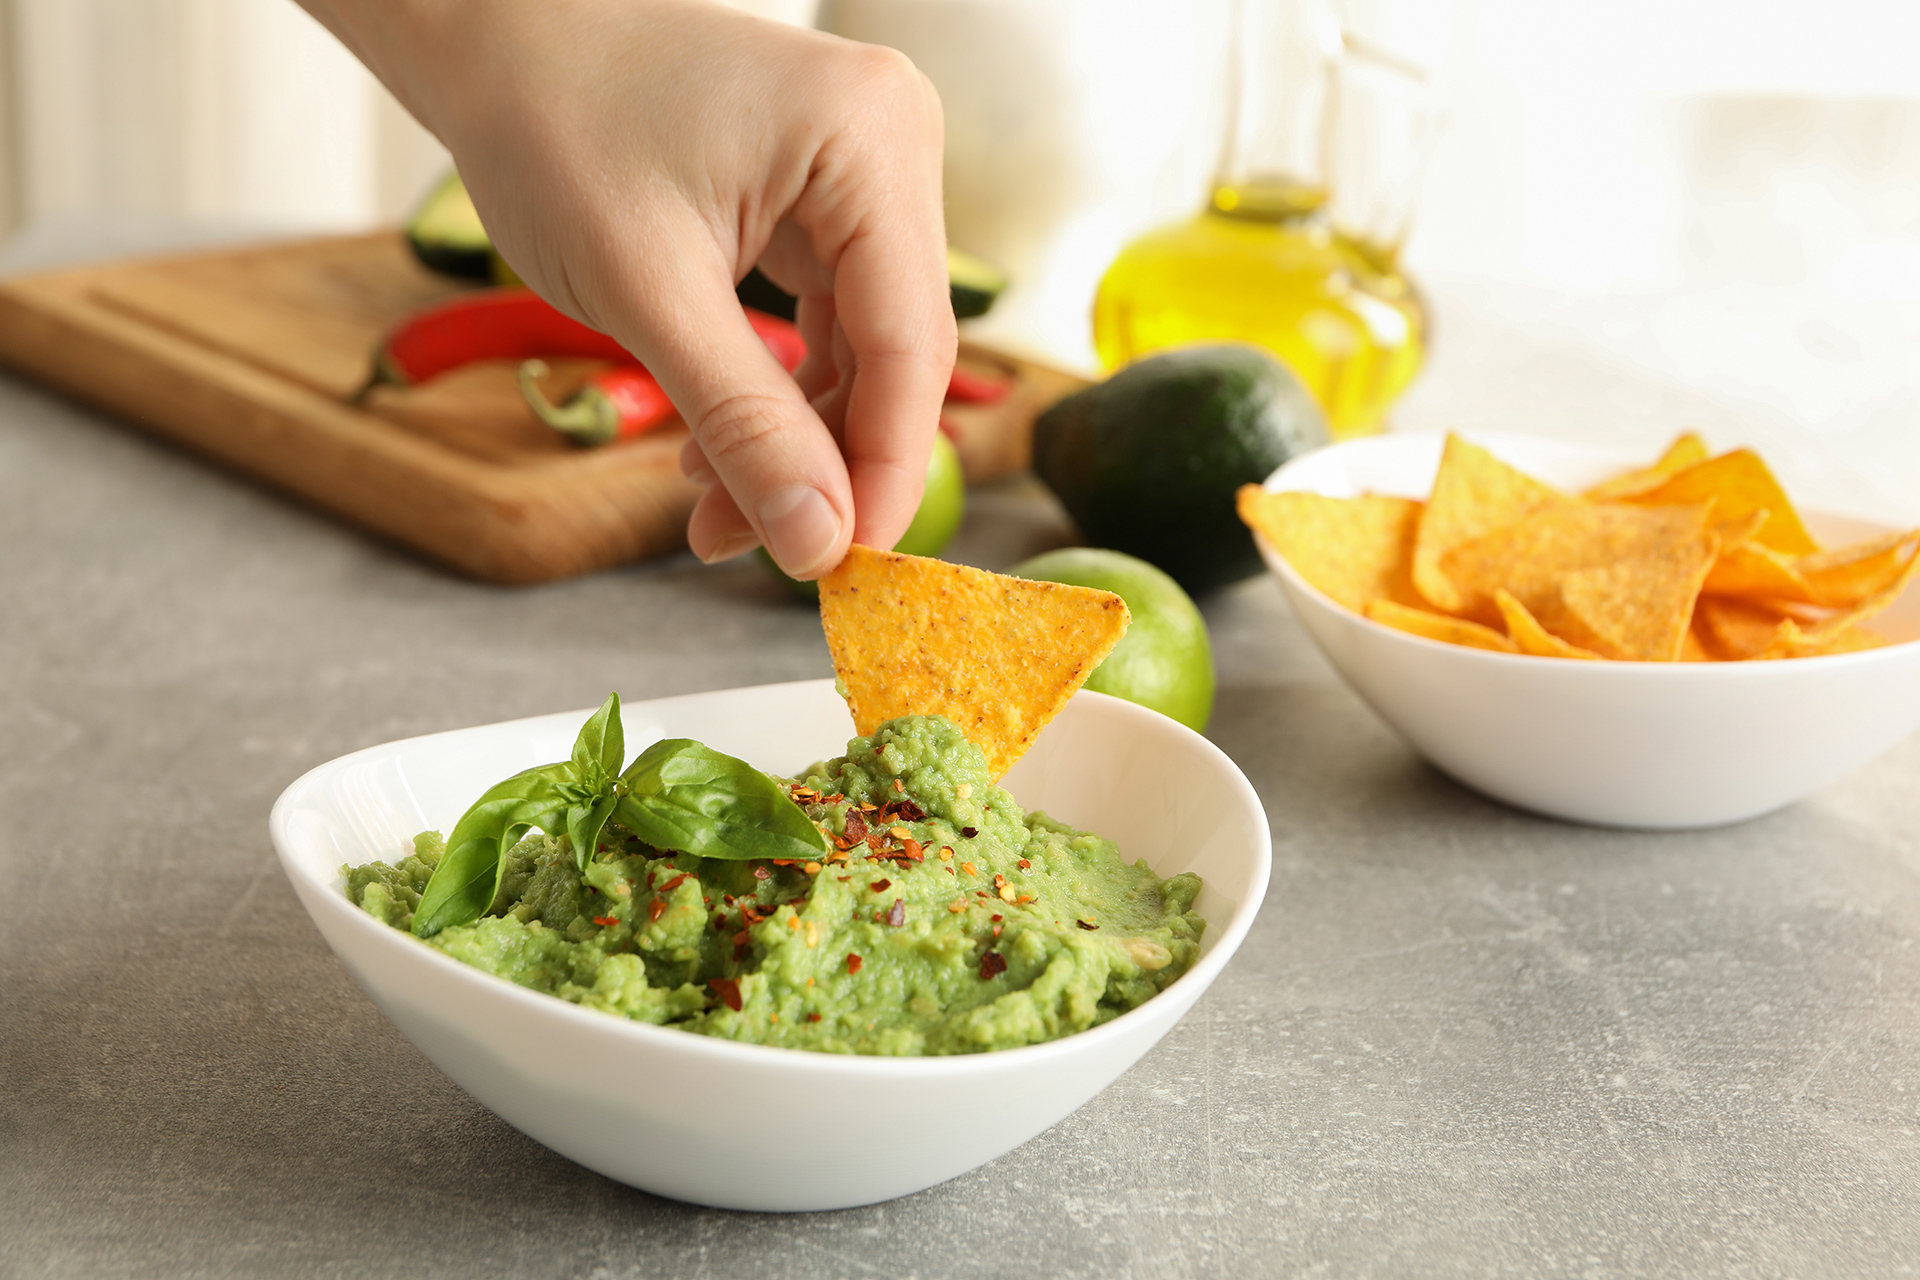 Homemade guacamole sauce recipe